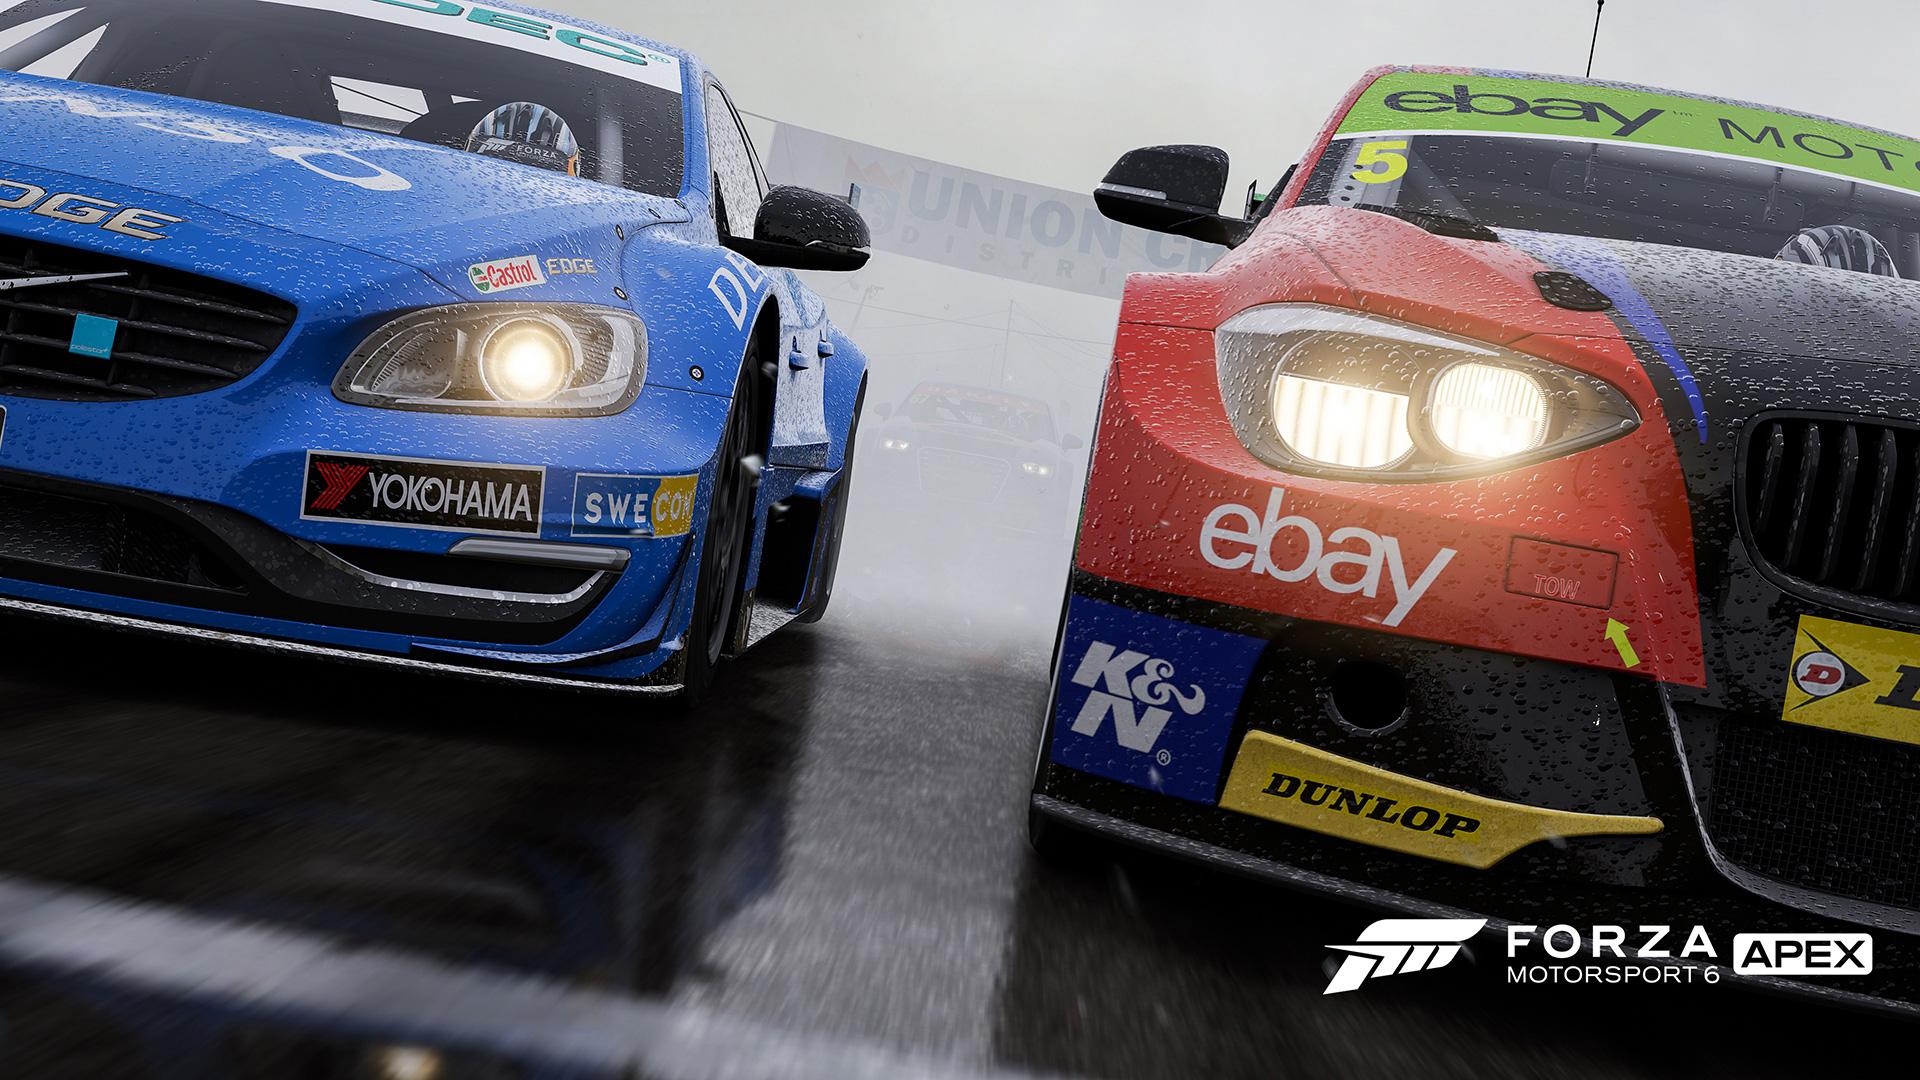 Forza Motorsport - Forza Motorsport 6: Apex Open Beta